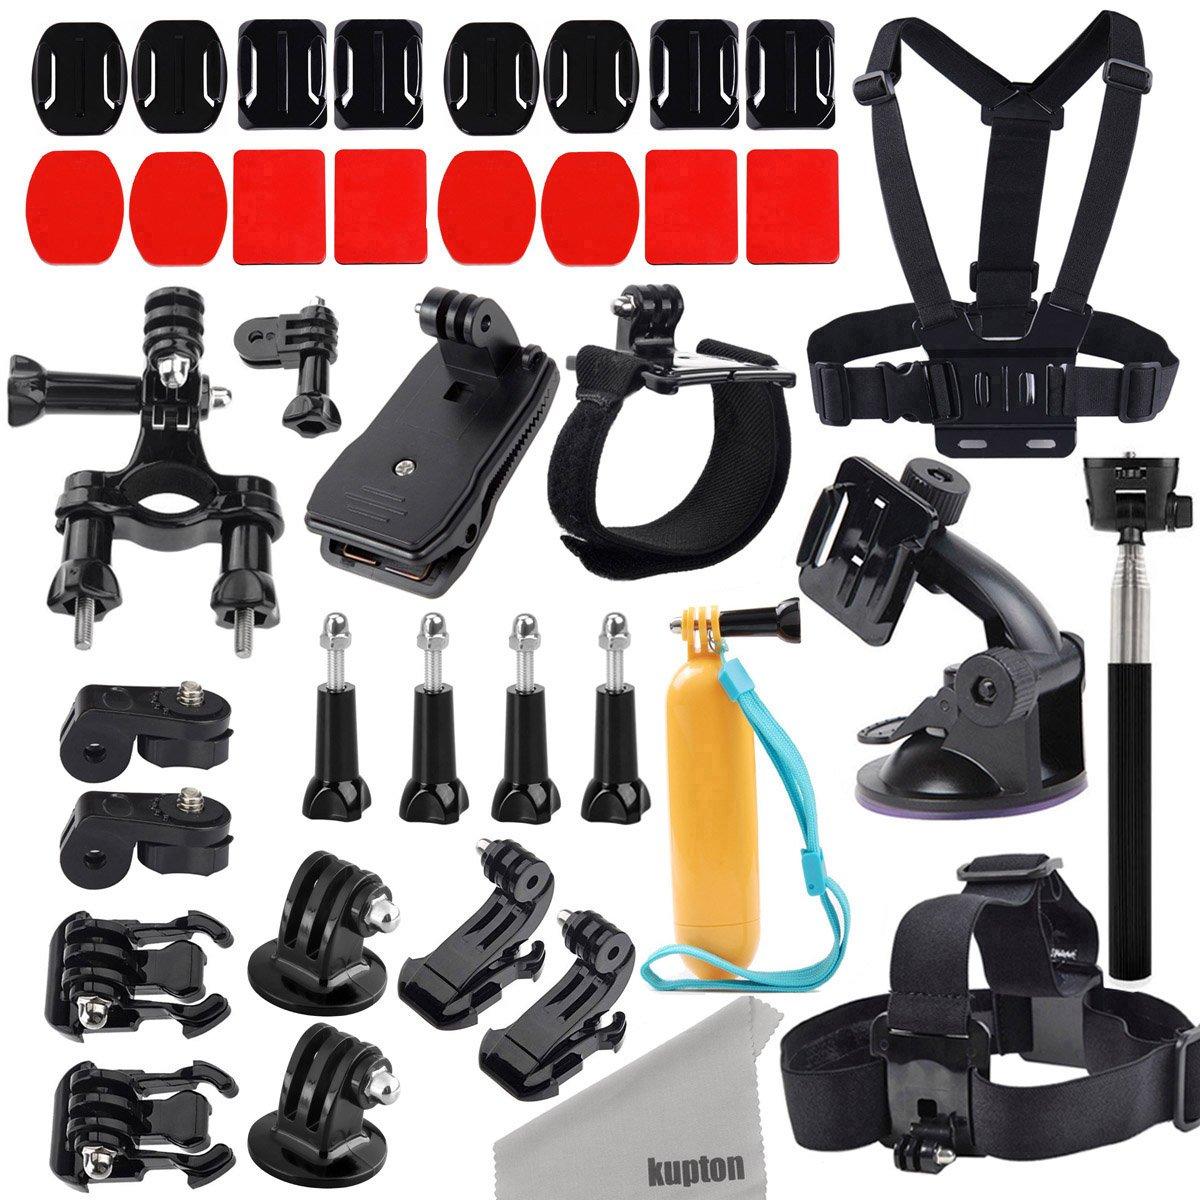 Kupton Action Camera Mount Accessories Kit for GoPro Hero 7 / Fusion/ GoPro Hero 6/5 / Session Xiaomi Yi/4K GeekPro ANART DBPOWER Lightdow ASX Action Pro Chest/Head/Wrist/Car/Bike/Floaty/Selfie Stick/Quick Clip